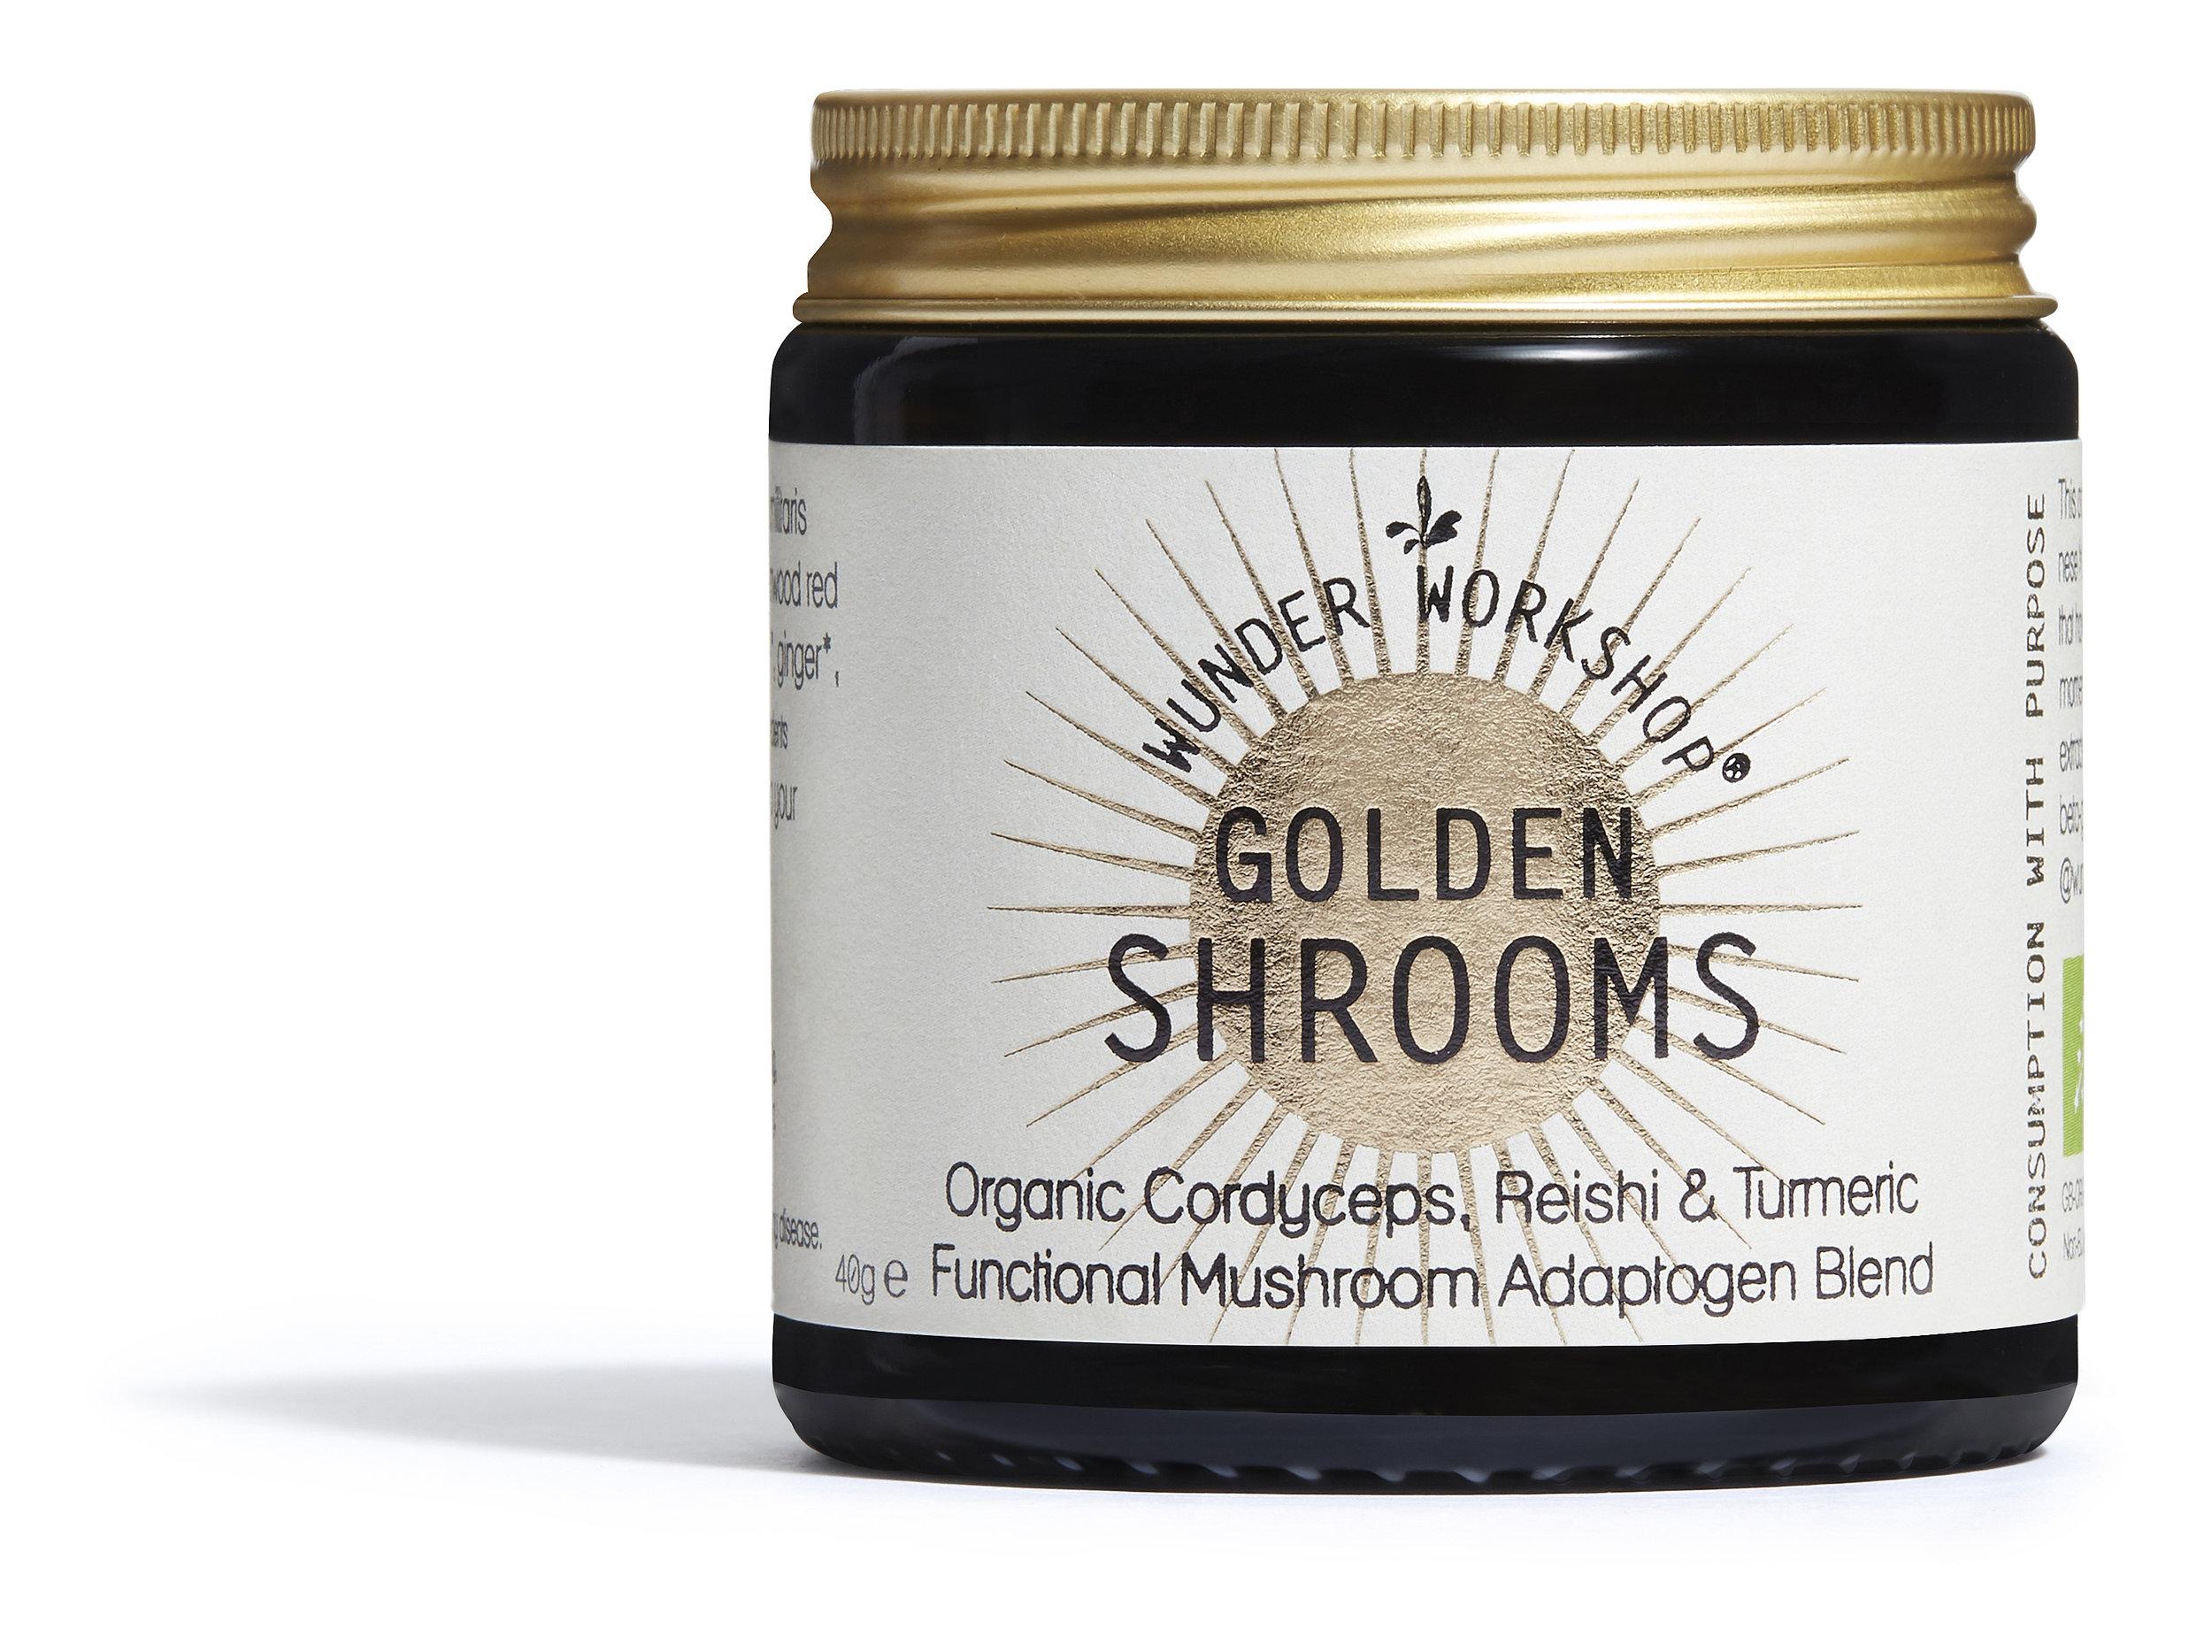 Golden shrooms cordyceps